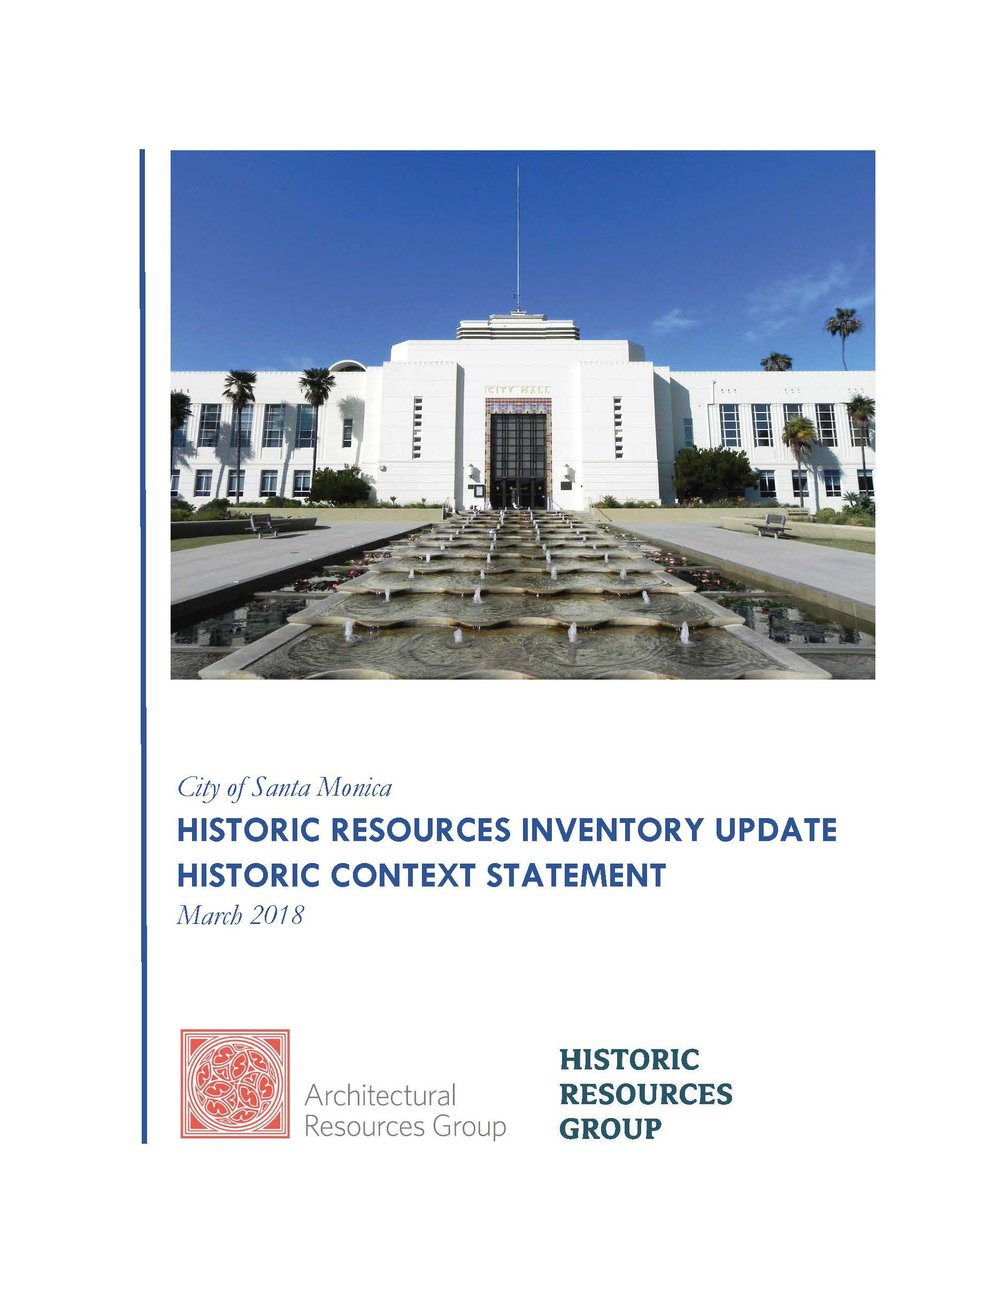 Santa Monica Citywide Historic Context Statement_Final_3.20.2018.jpg